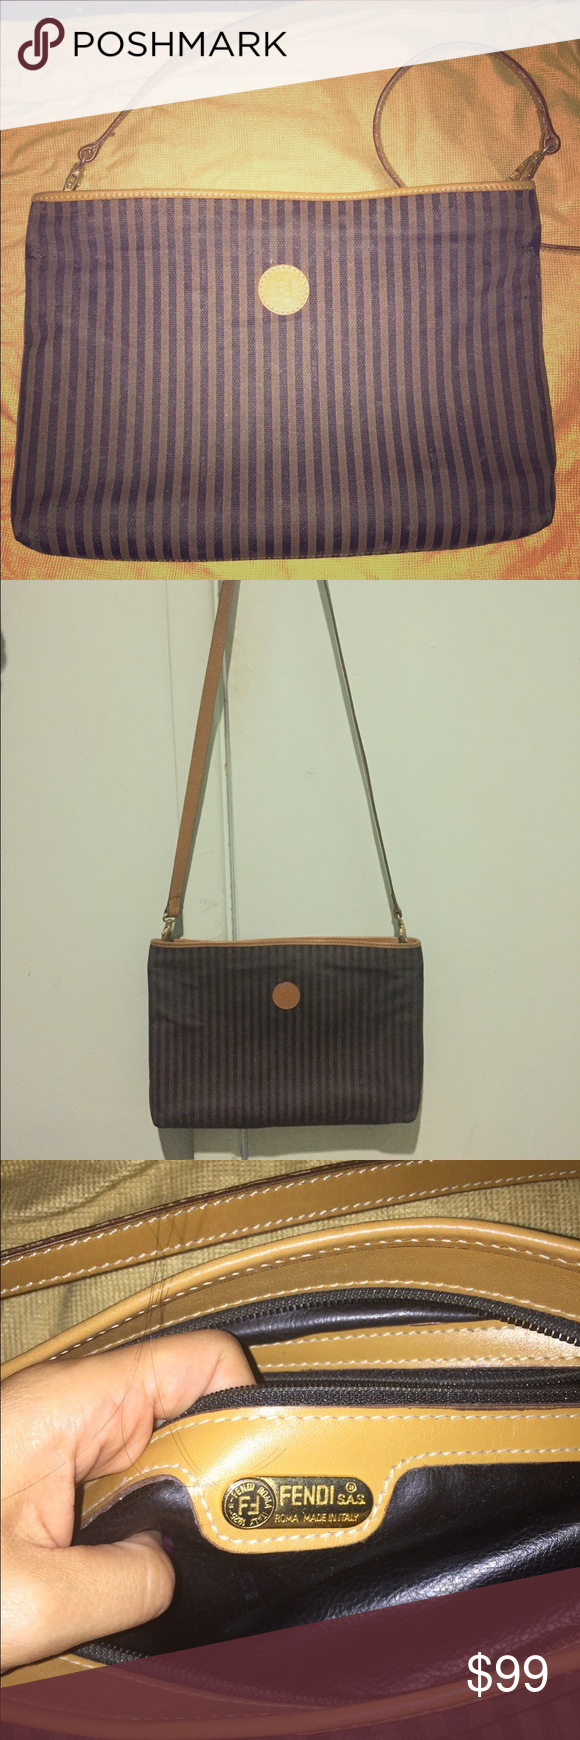 b797656fca Fendi Vintage Roma Italy 1925 Shoulder Bag Vintage fendi thin striped  shoulder bag. Very gently worn